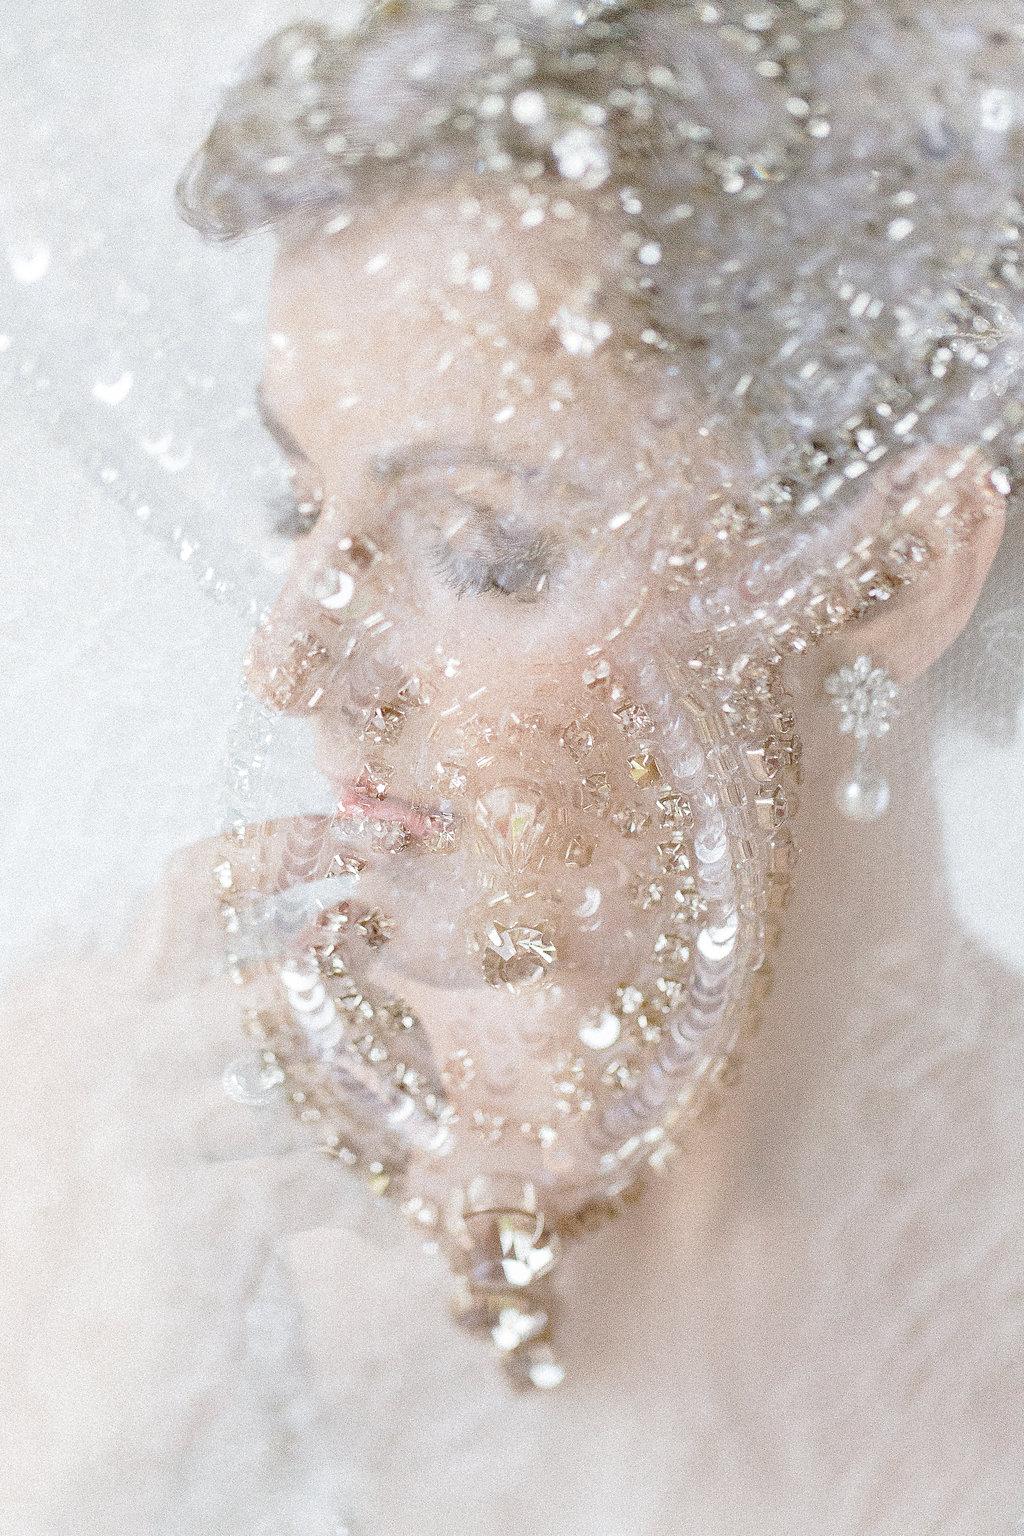 Verona-Destination-Wedding-Inspiration-by-Kibogo-Photography25.jpg